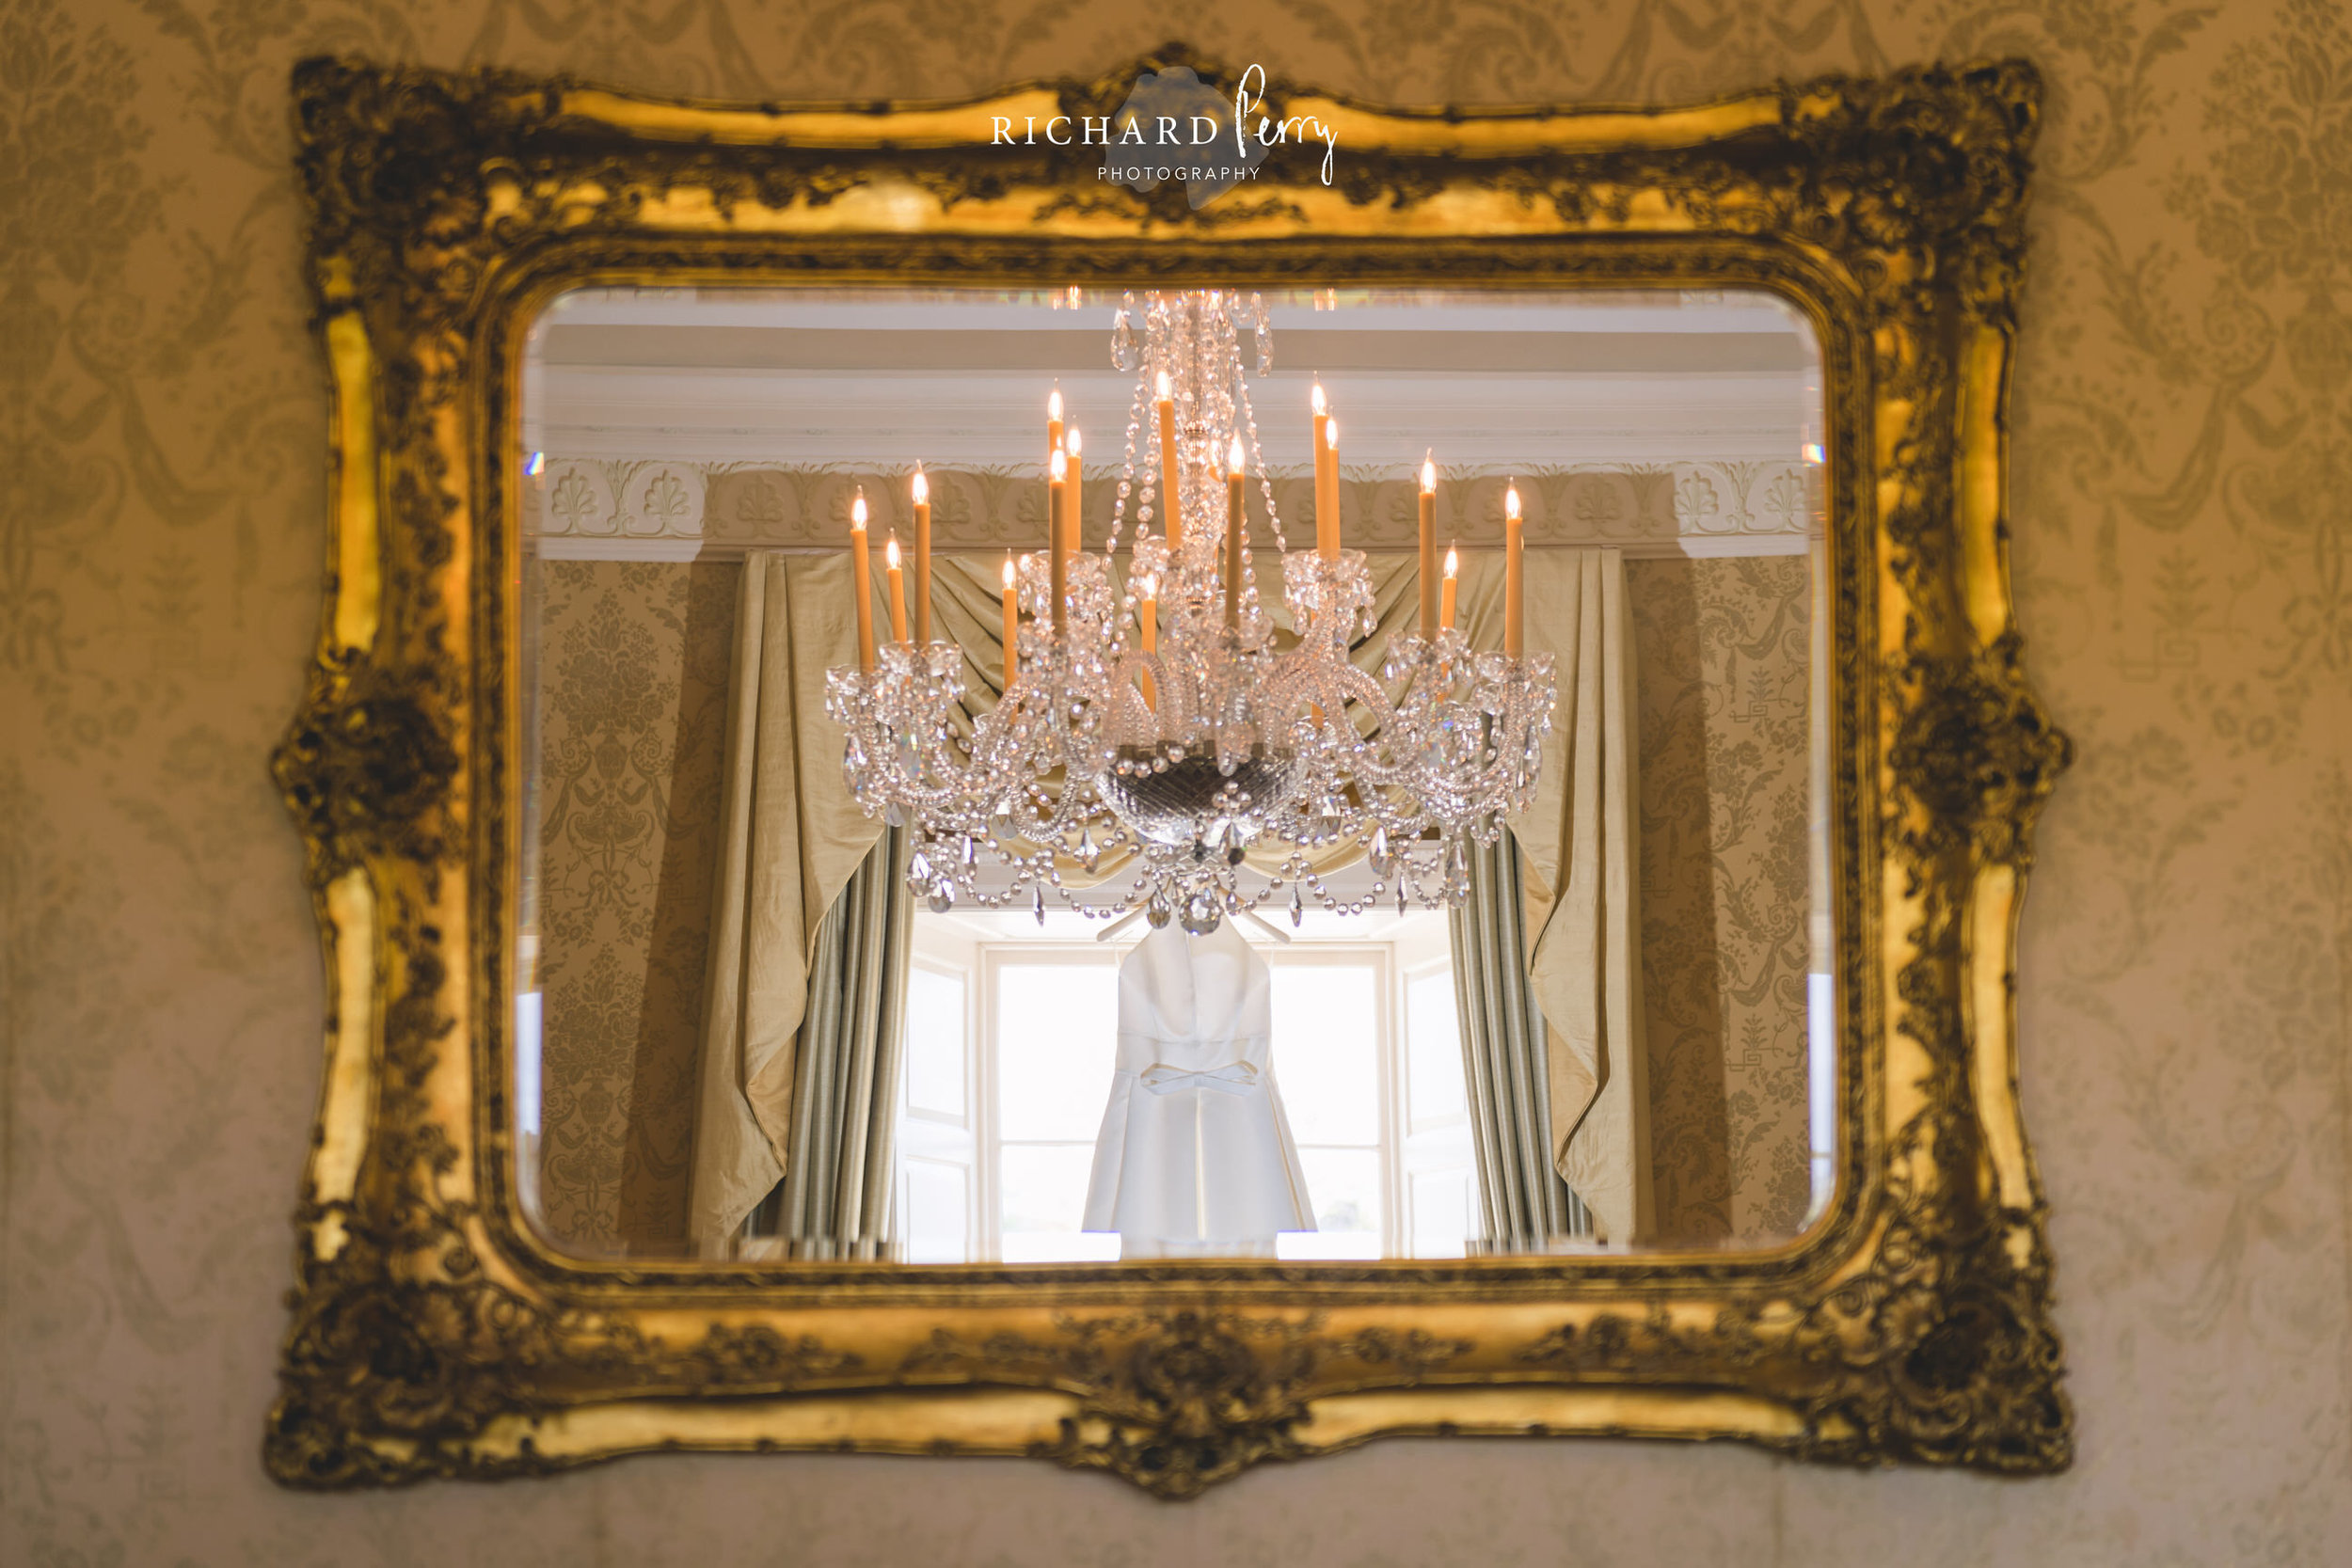 yorkshire-wedding-photographer-destination-archerfield-house-2.jpg